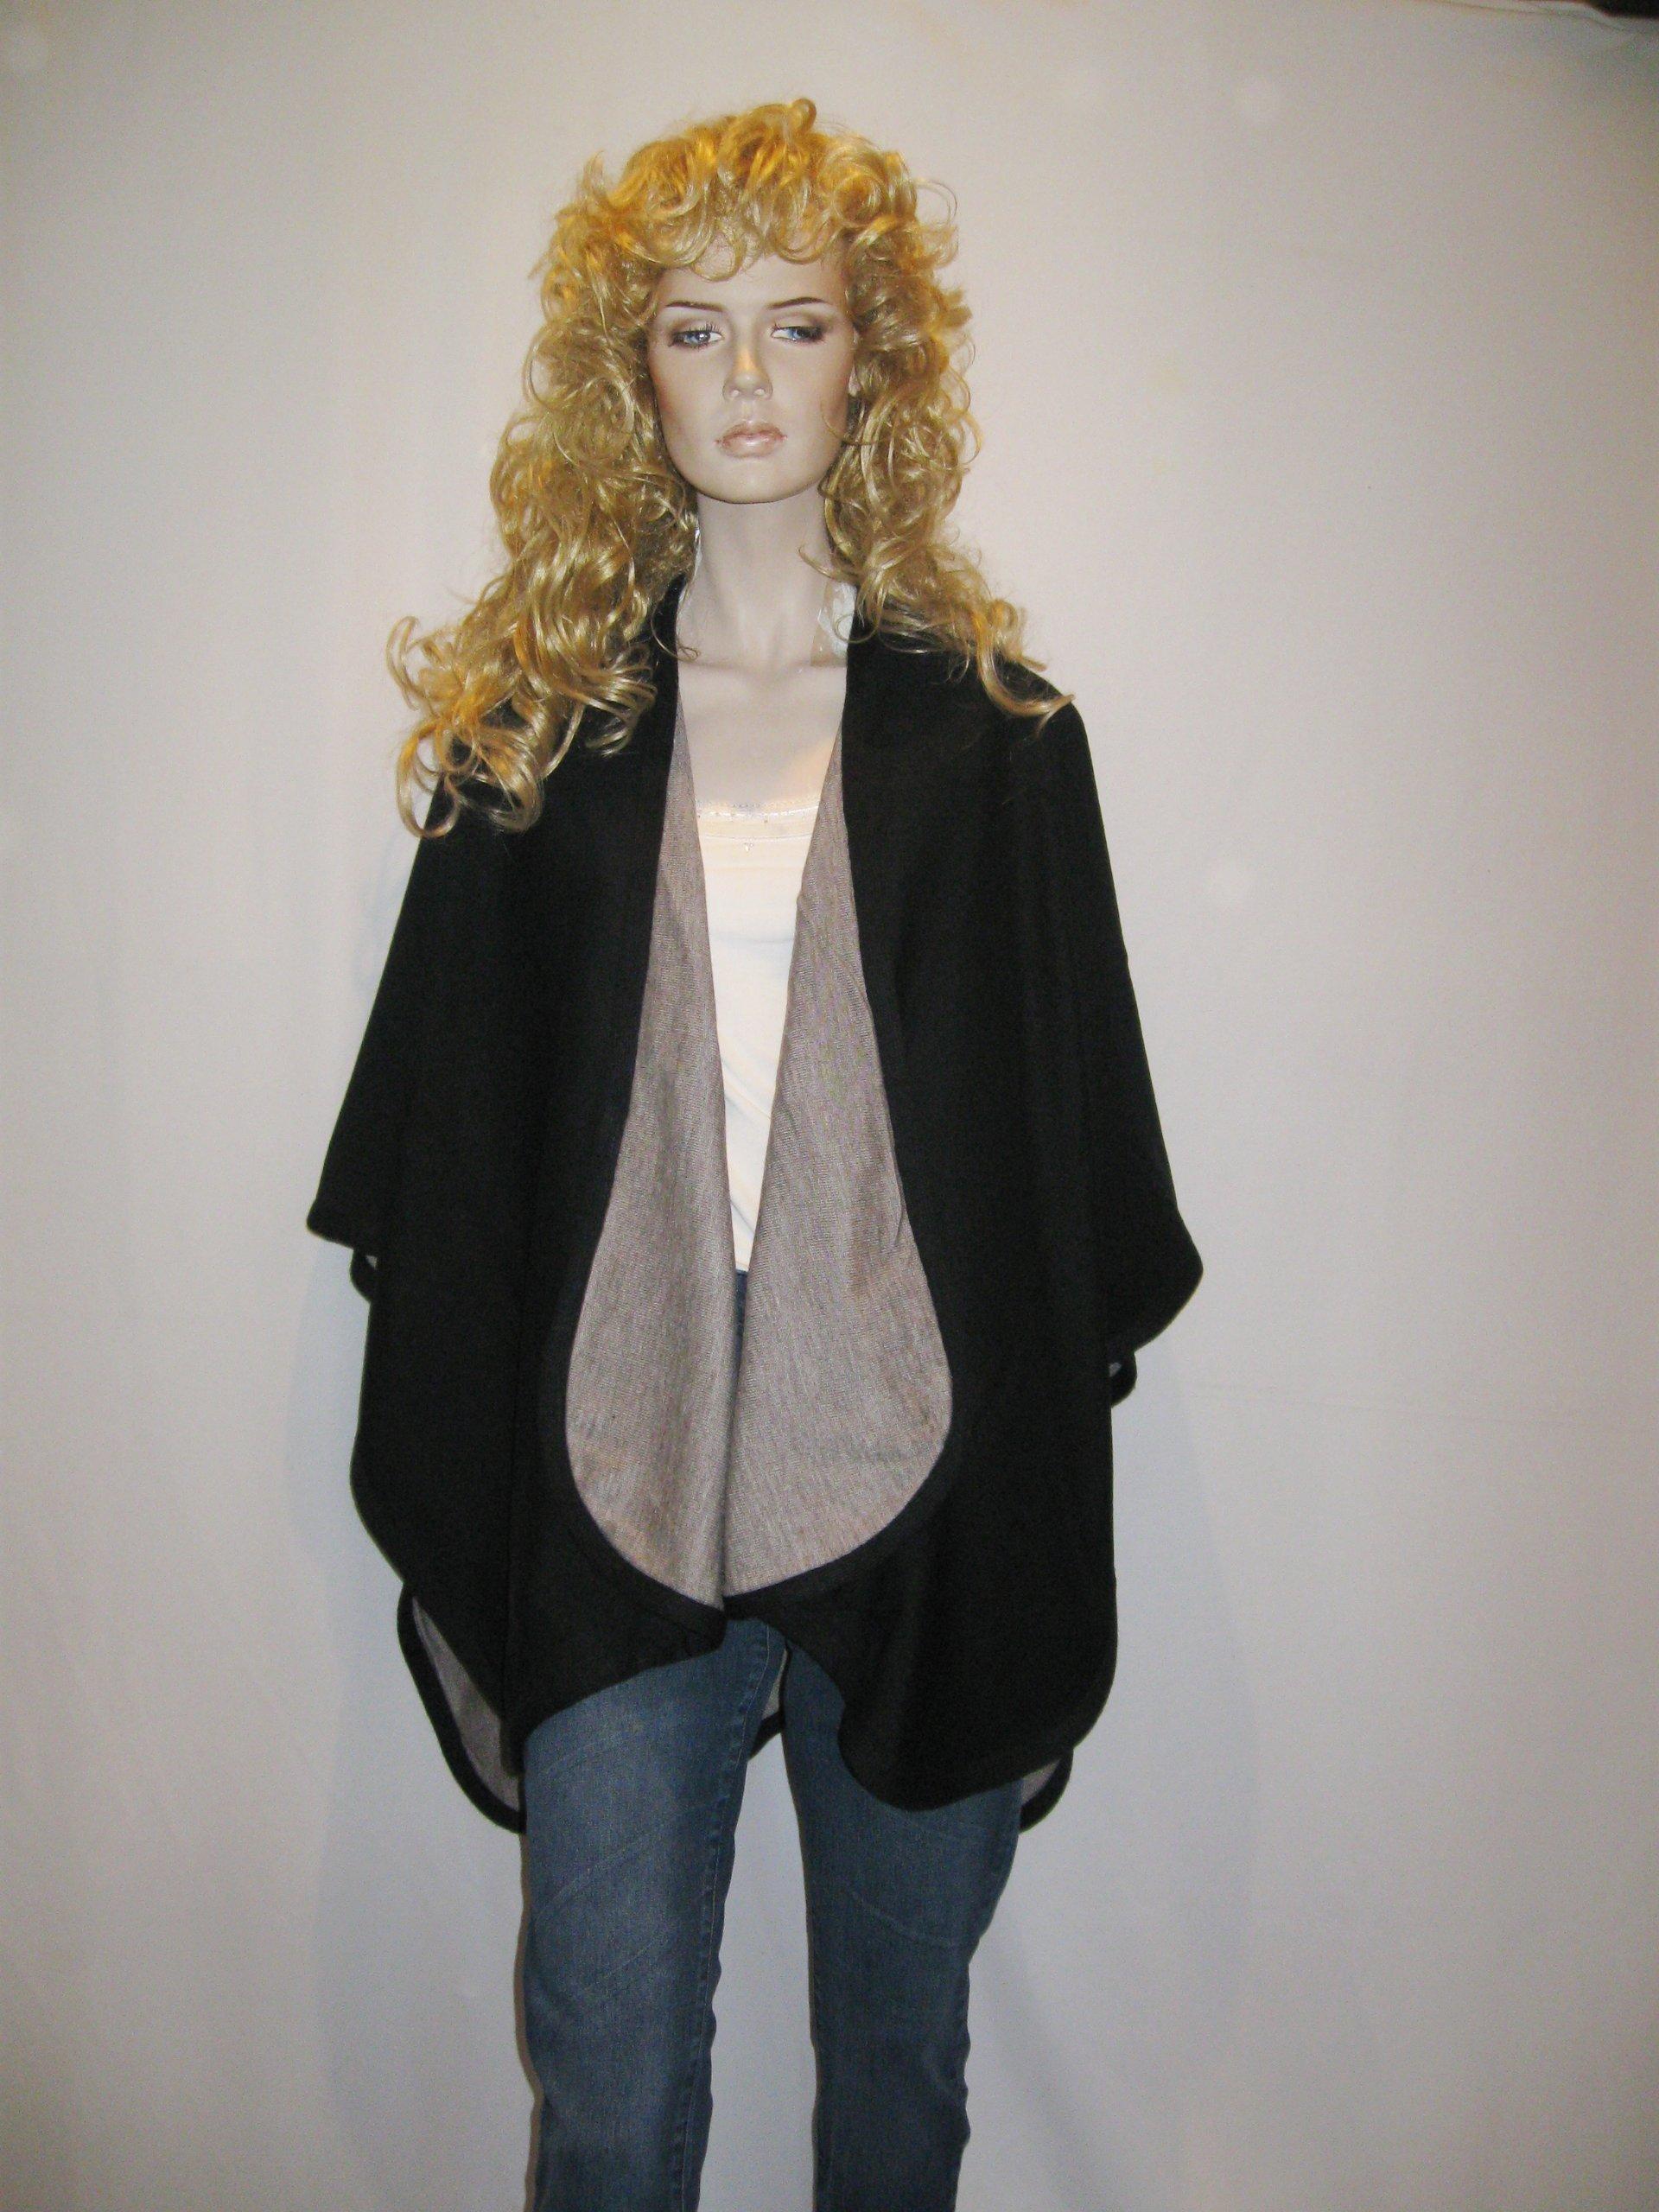 Cashmere Pashmina Group- Cape Woolen Reversible Ruana Knitted Poncho Shawl Cardigans Sweater Coat (Black/ Stone) by Cashmere Pashmina Group (Image #8)